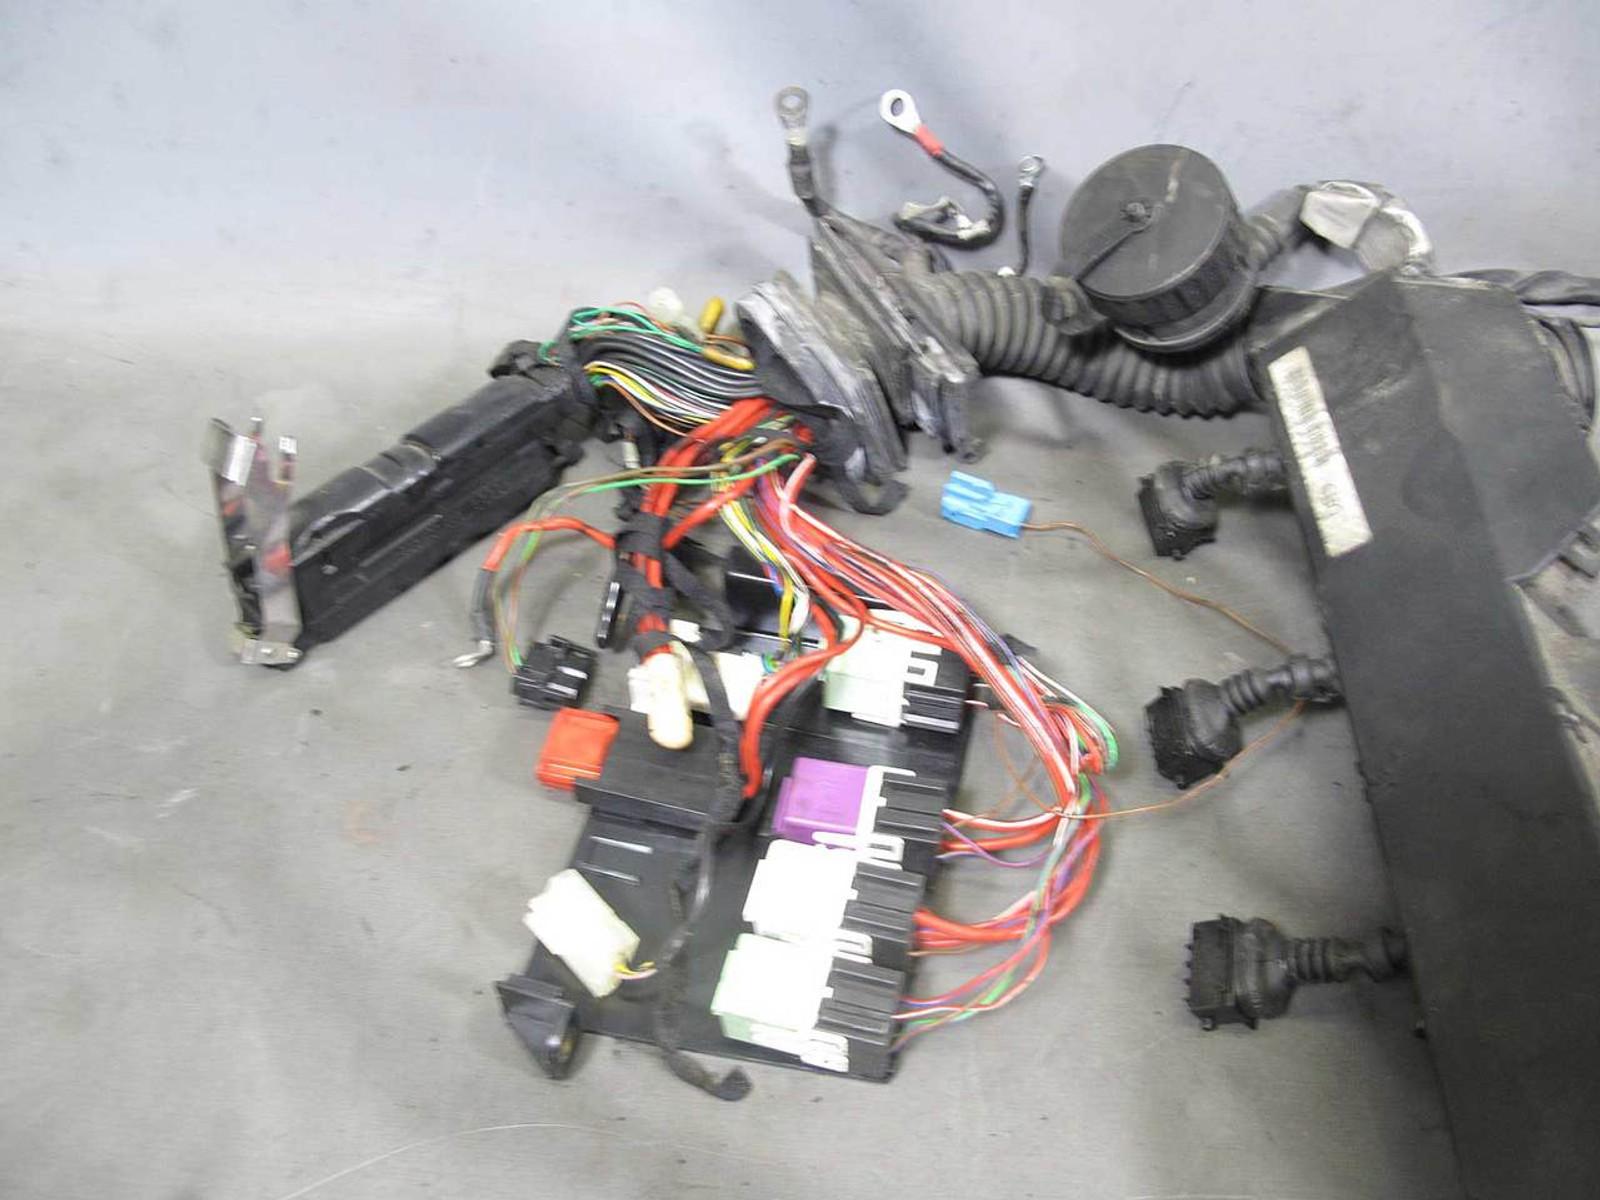 1995 Bmw Wiring Harness   Wiring Diagram Ebook  Bmw Engine Wiring Harness on bmw wiring kit, bmw water pump, e30 temp sensor harness, ford 7 3 injector harness, bmw fuses, cover for wire harness, bmw e46 stereo wiring diagram, ignition coil harness, bmw oil filter, bmw harness to pioneer, bmw relays, chevy 6 5 glow plug harness, bmw blower motor, bmw k motorcycle wiring, bmw 328 front wiring, bmw 528i wire harness replacement, bmw 740 transmission harness, bmw heater core, bmw engine harness, bmw radio,